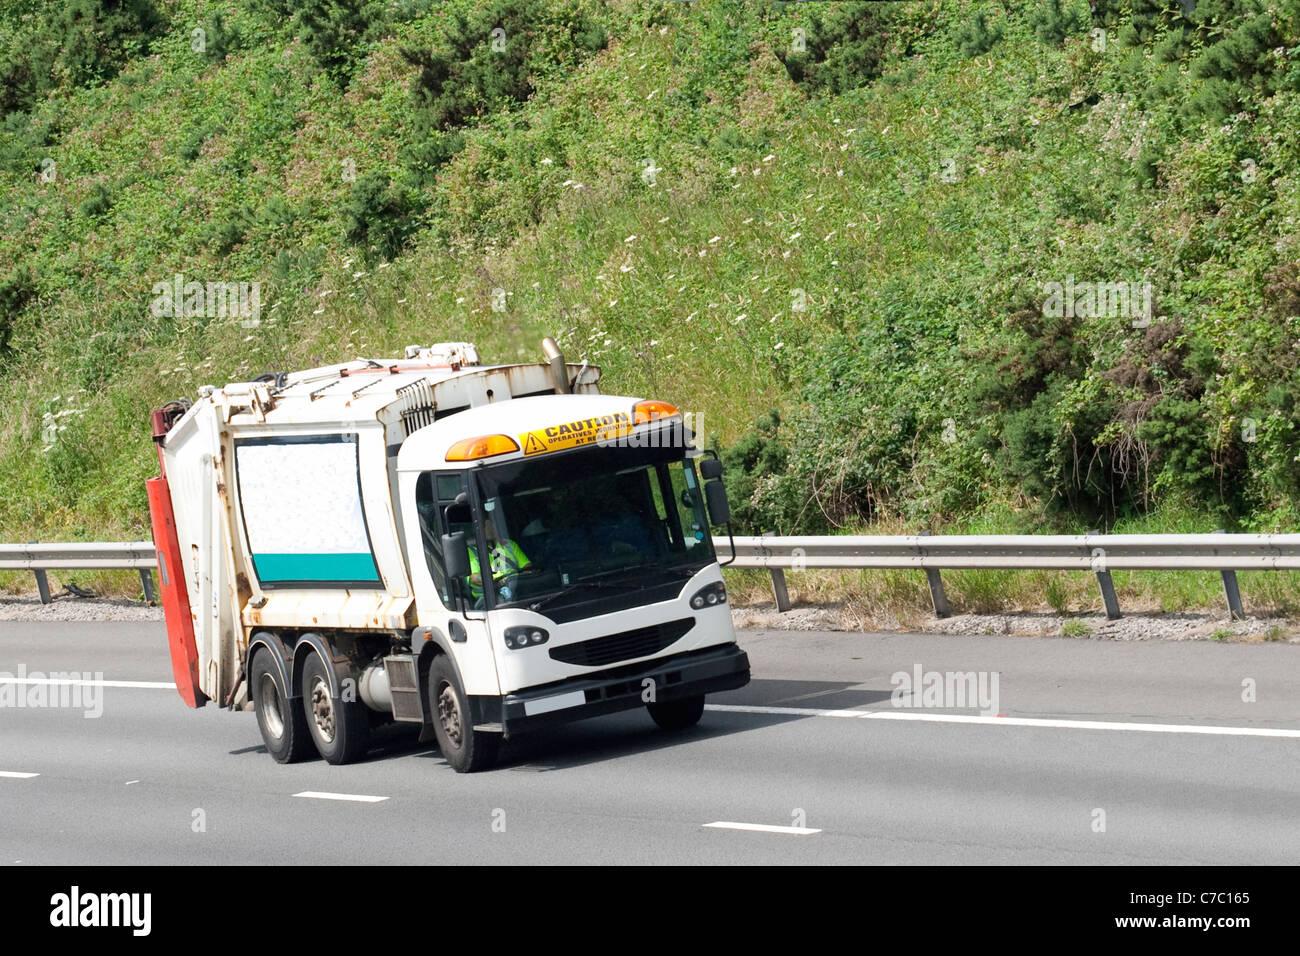 Tanker lorry or truck on road or motorway - Stock Image